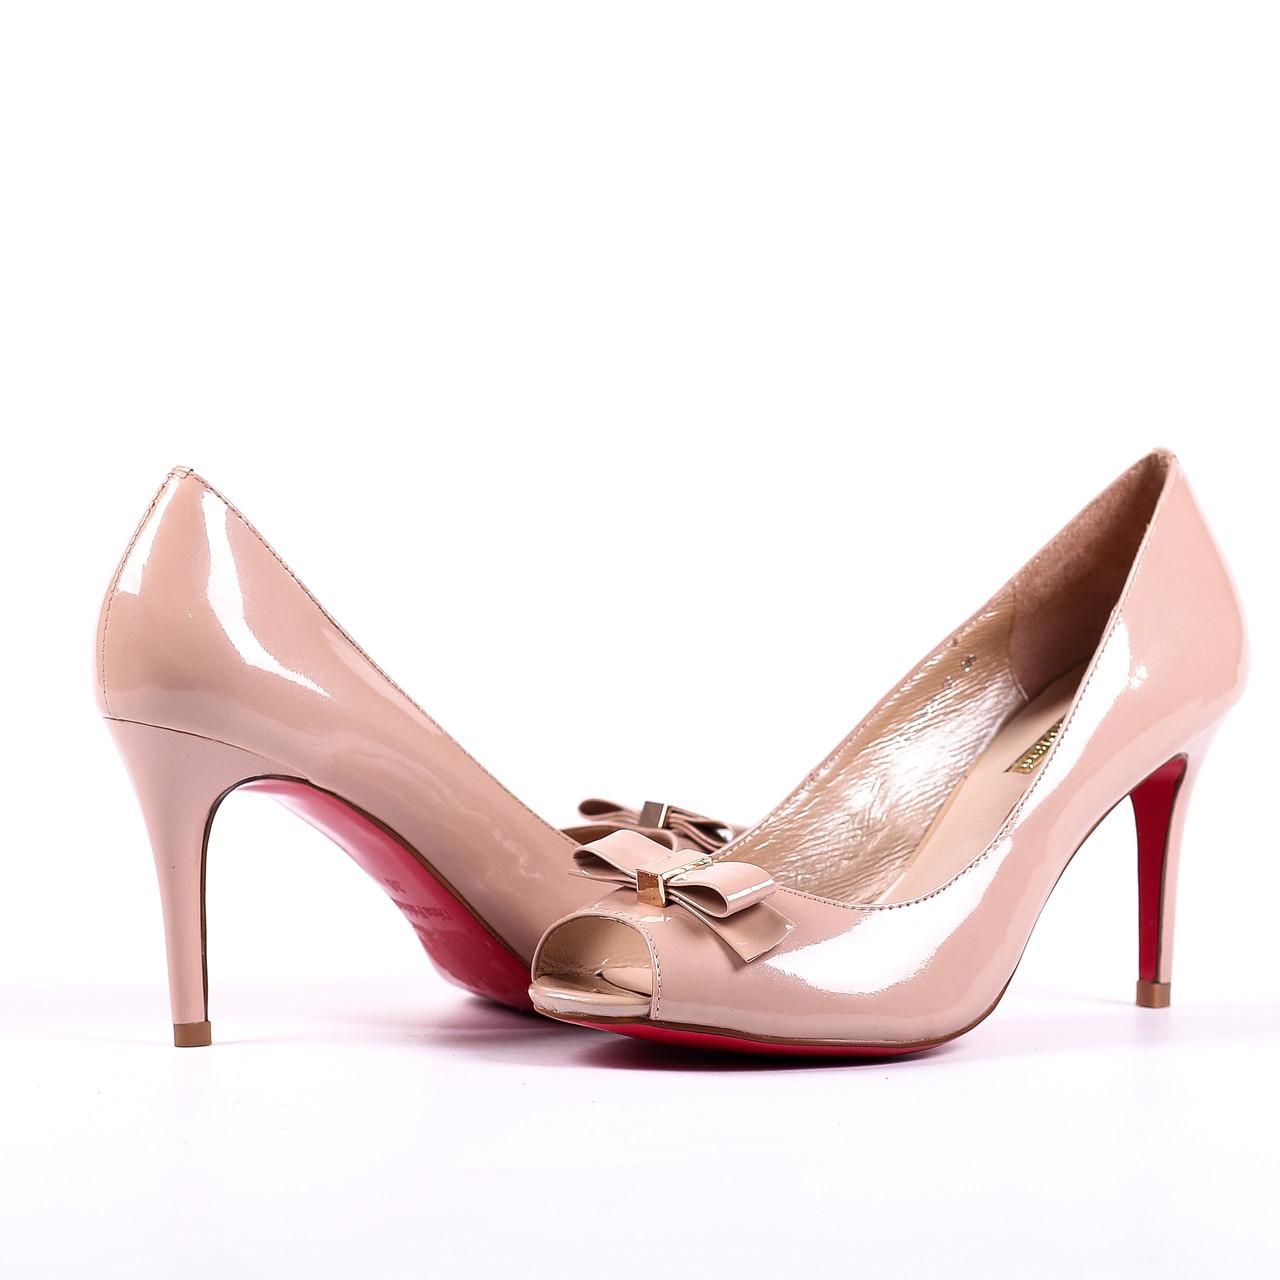 Женские туфли Dina Fabiani на каблуке кожаные бежевые